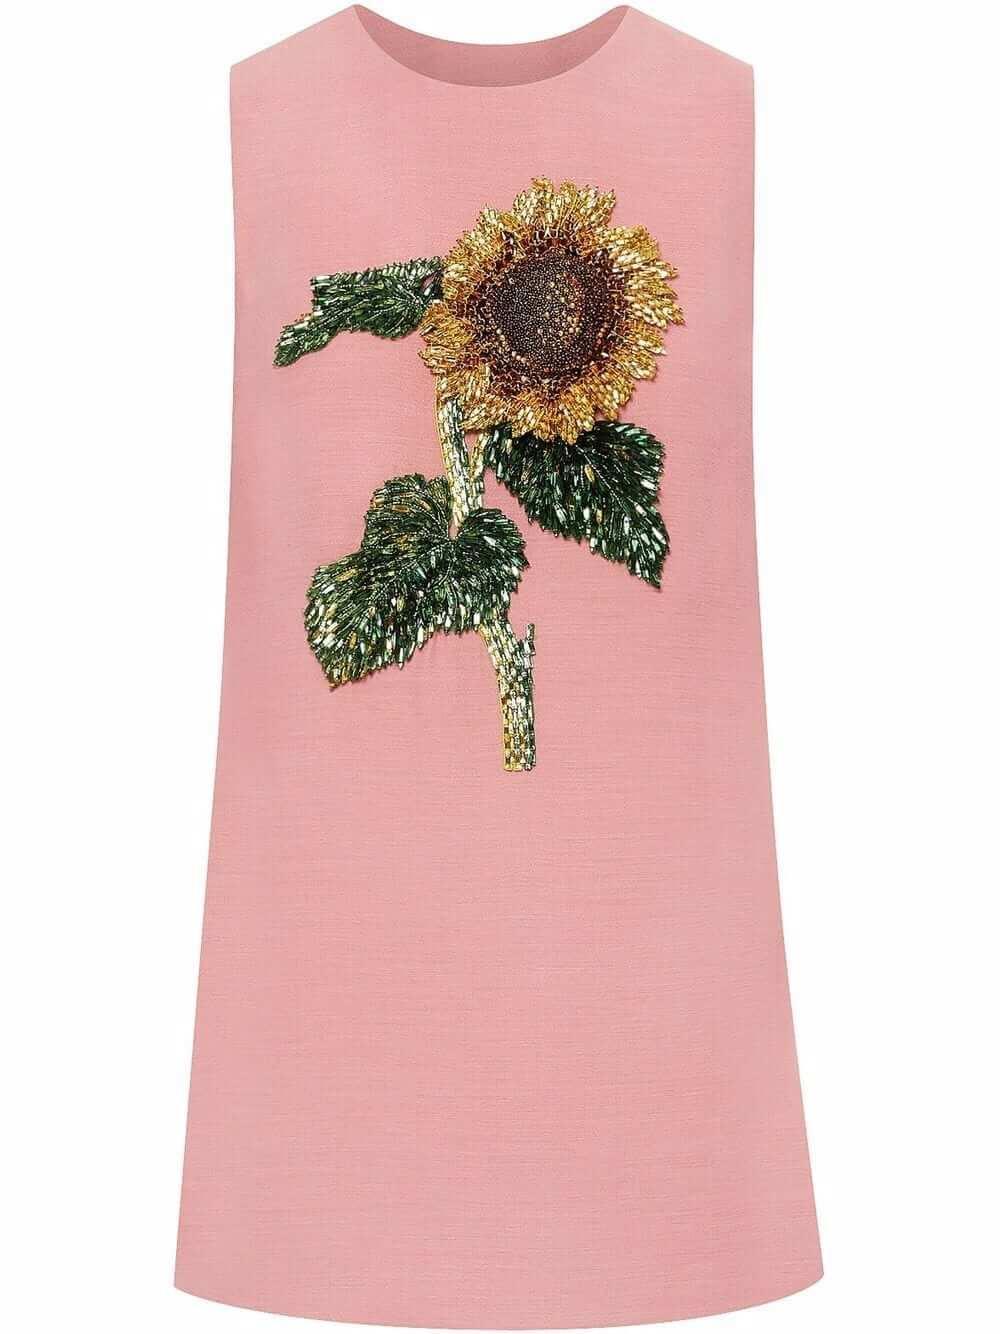 Sunflower Embroidered Shift Dress Item # 21FE249DSW